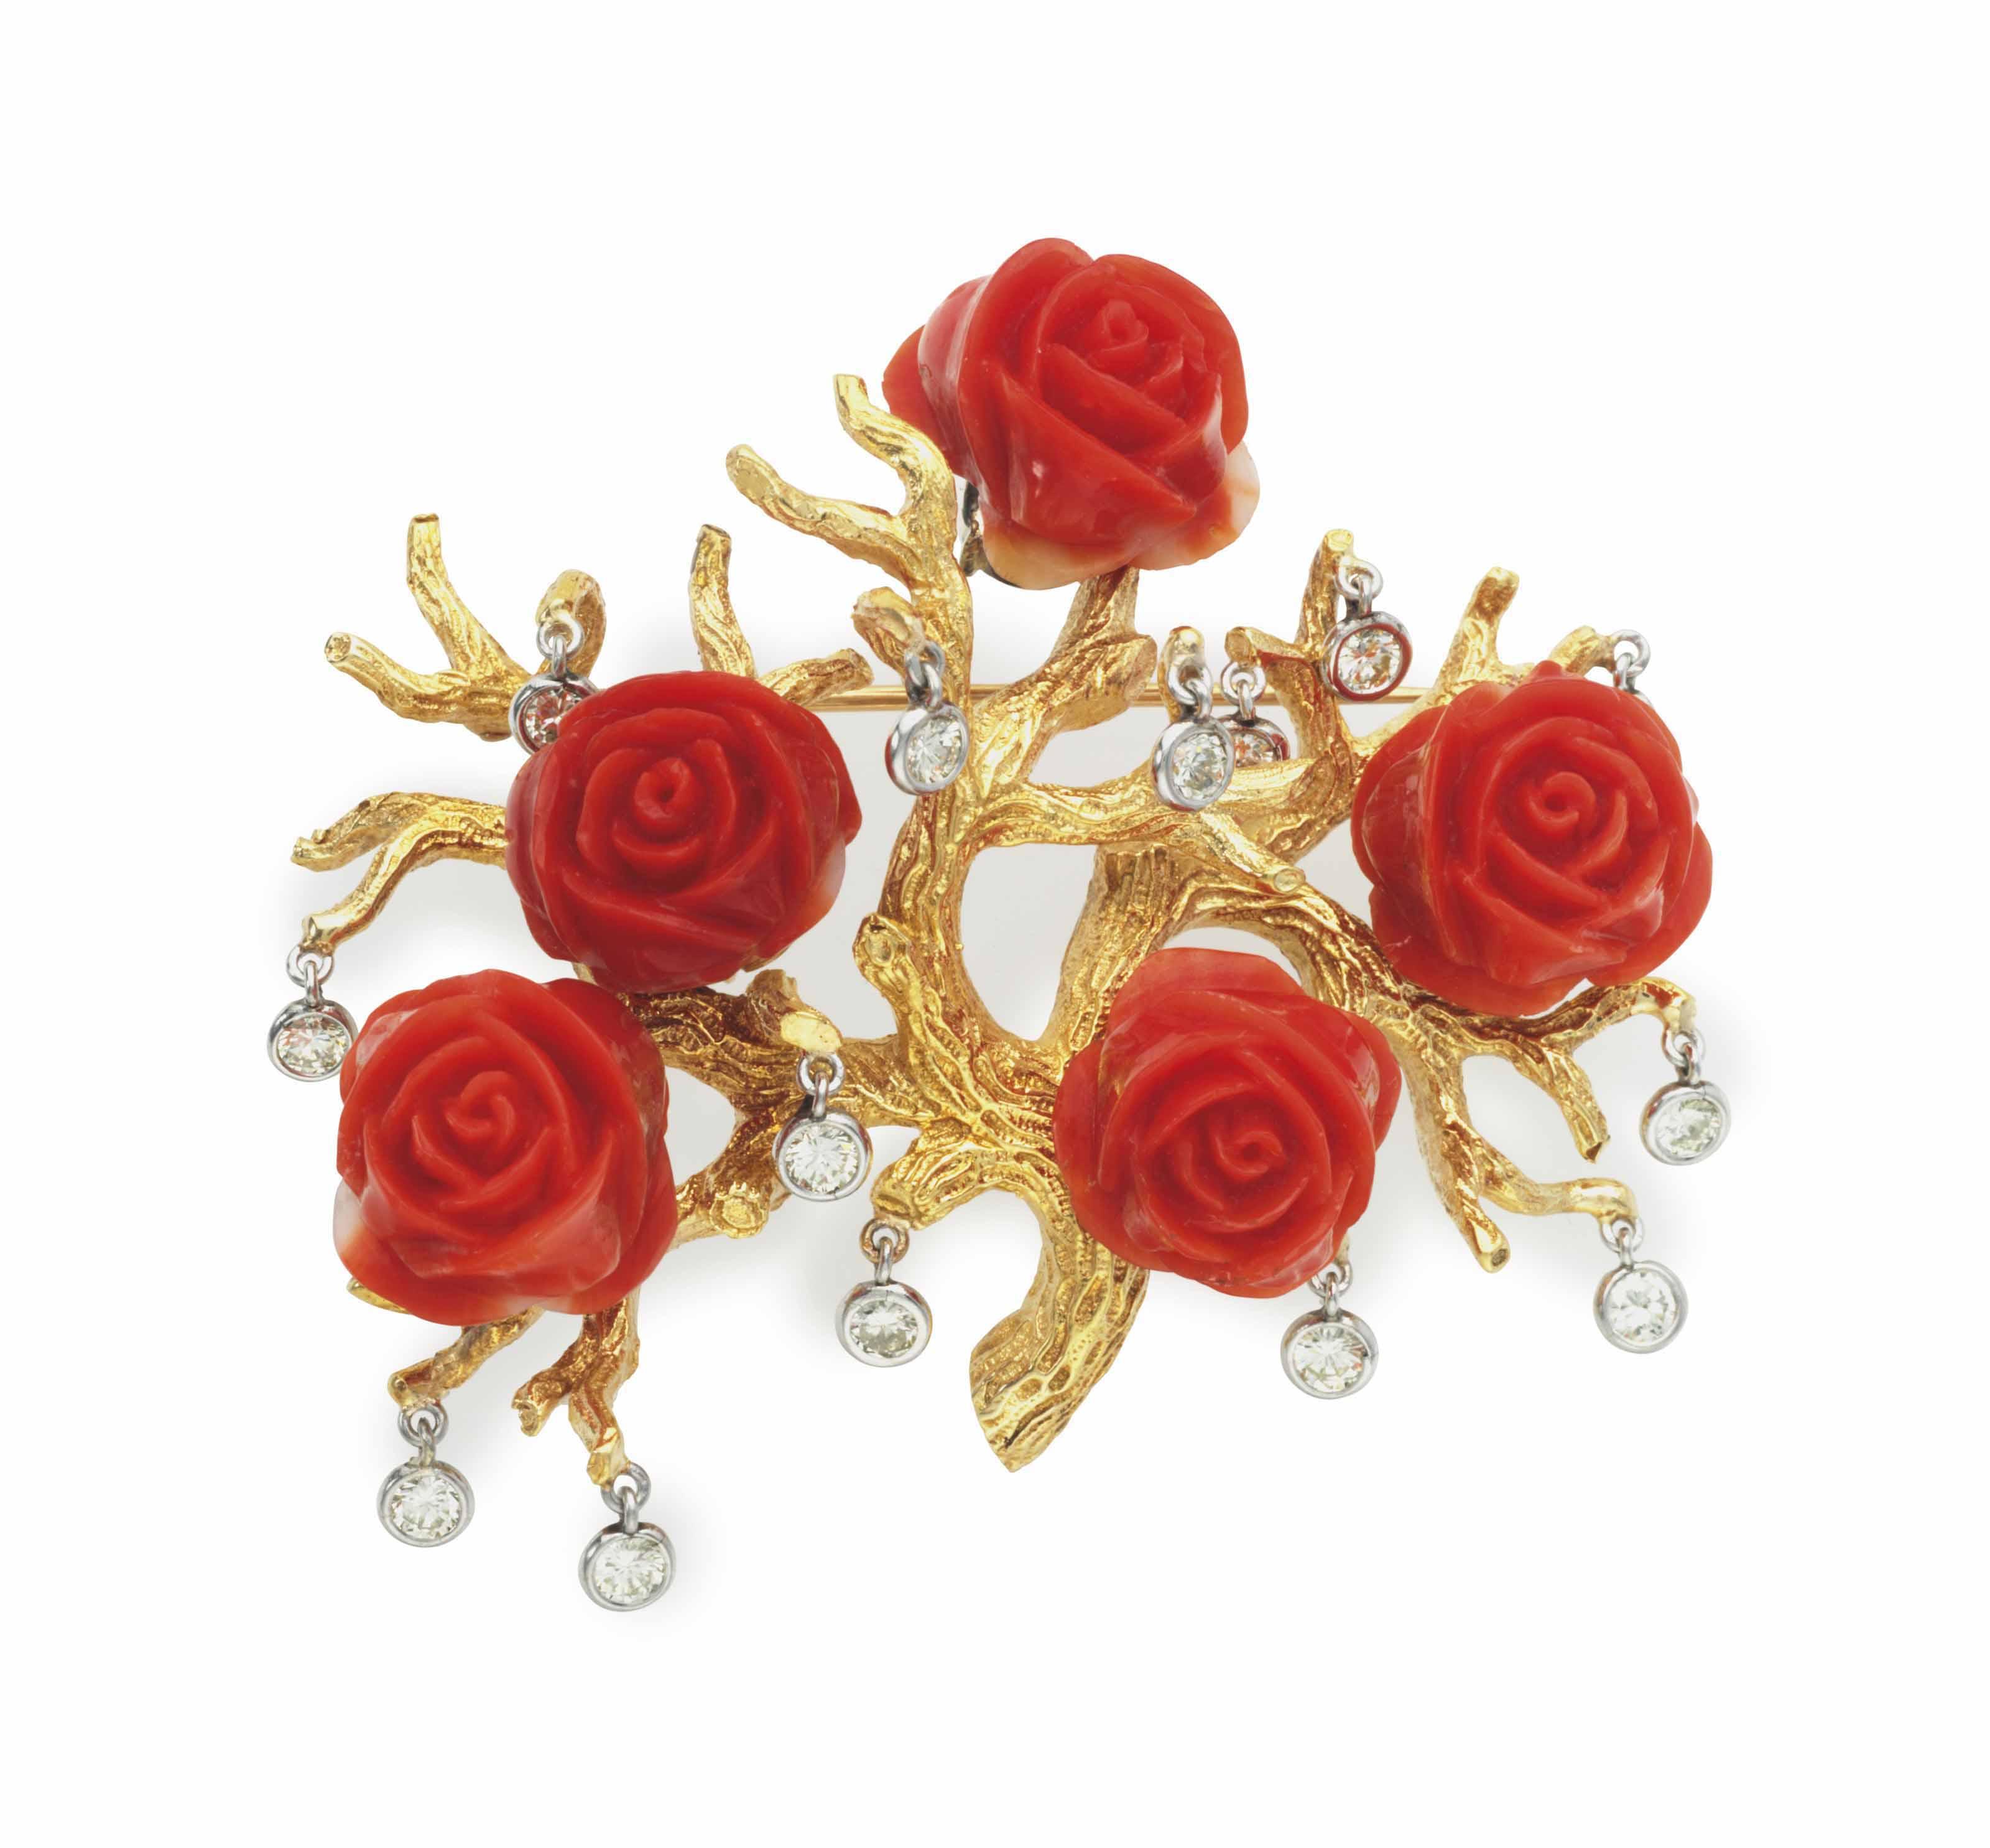 A DIAMOND, CORAL AND GOLD 'ROSE BUSH' PIN